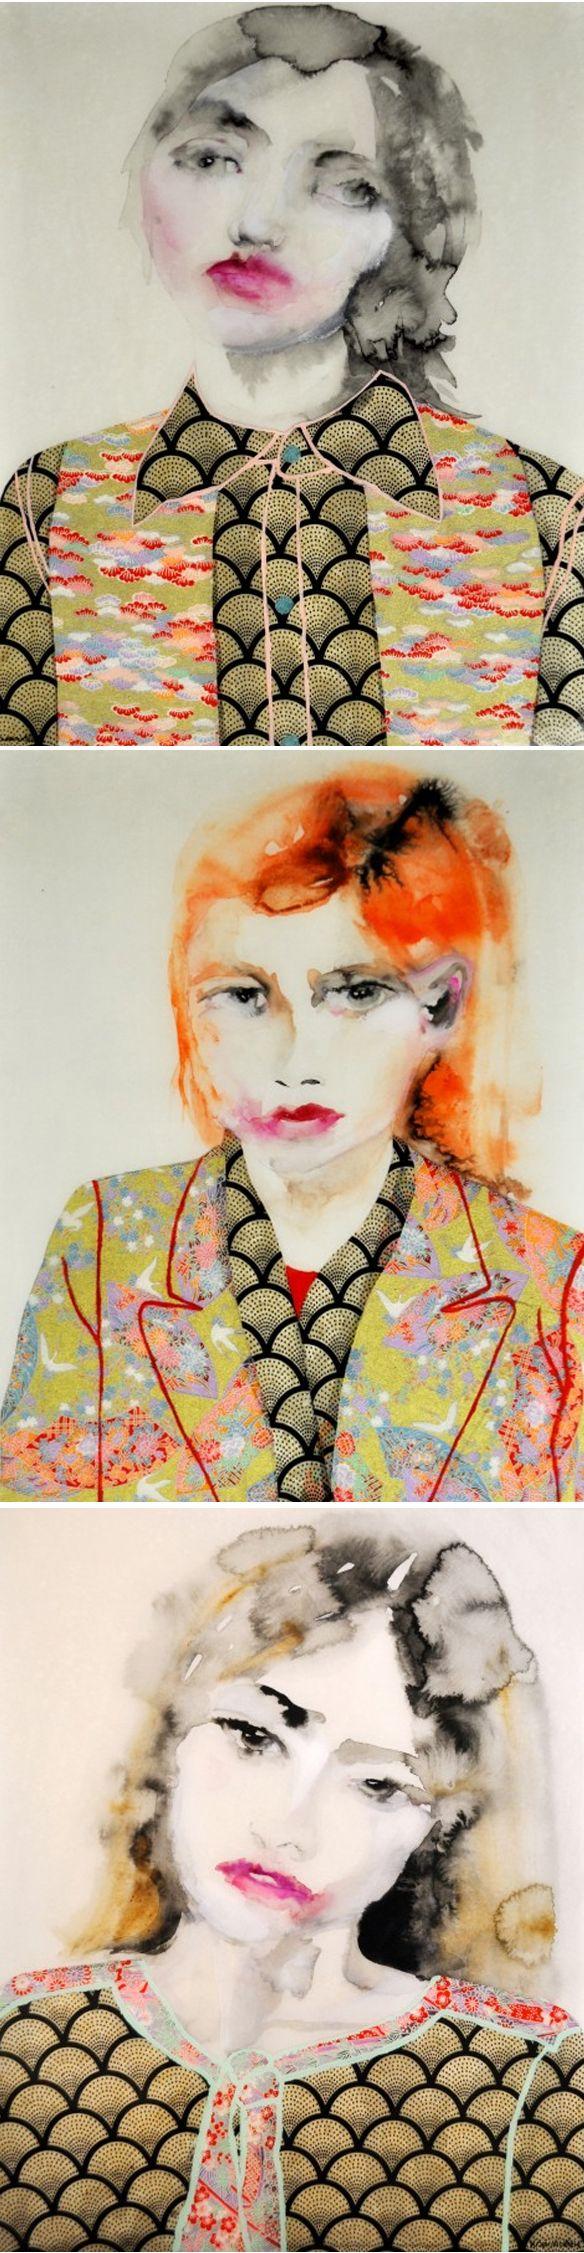 mixed media (paint & japanese paper) by lisa krannichfeld